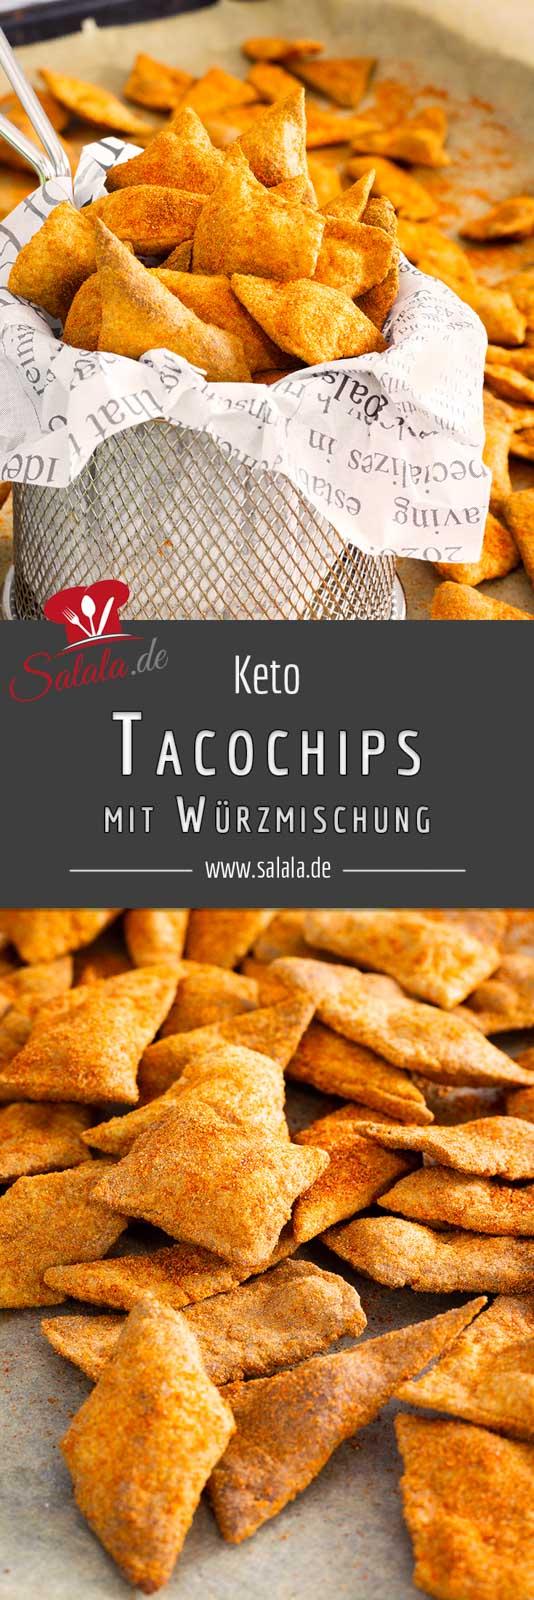 #tacochips #glutenfrei #lowcarbrezepte #lowcarbtacos #lowcarbchips #lowcarb #lowcarbbacken #lowcarbnaschen